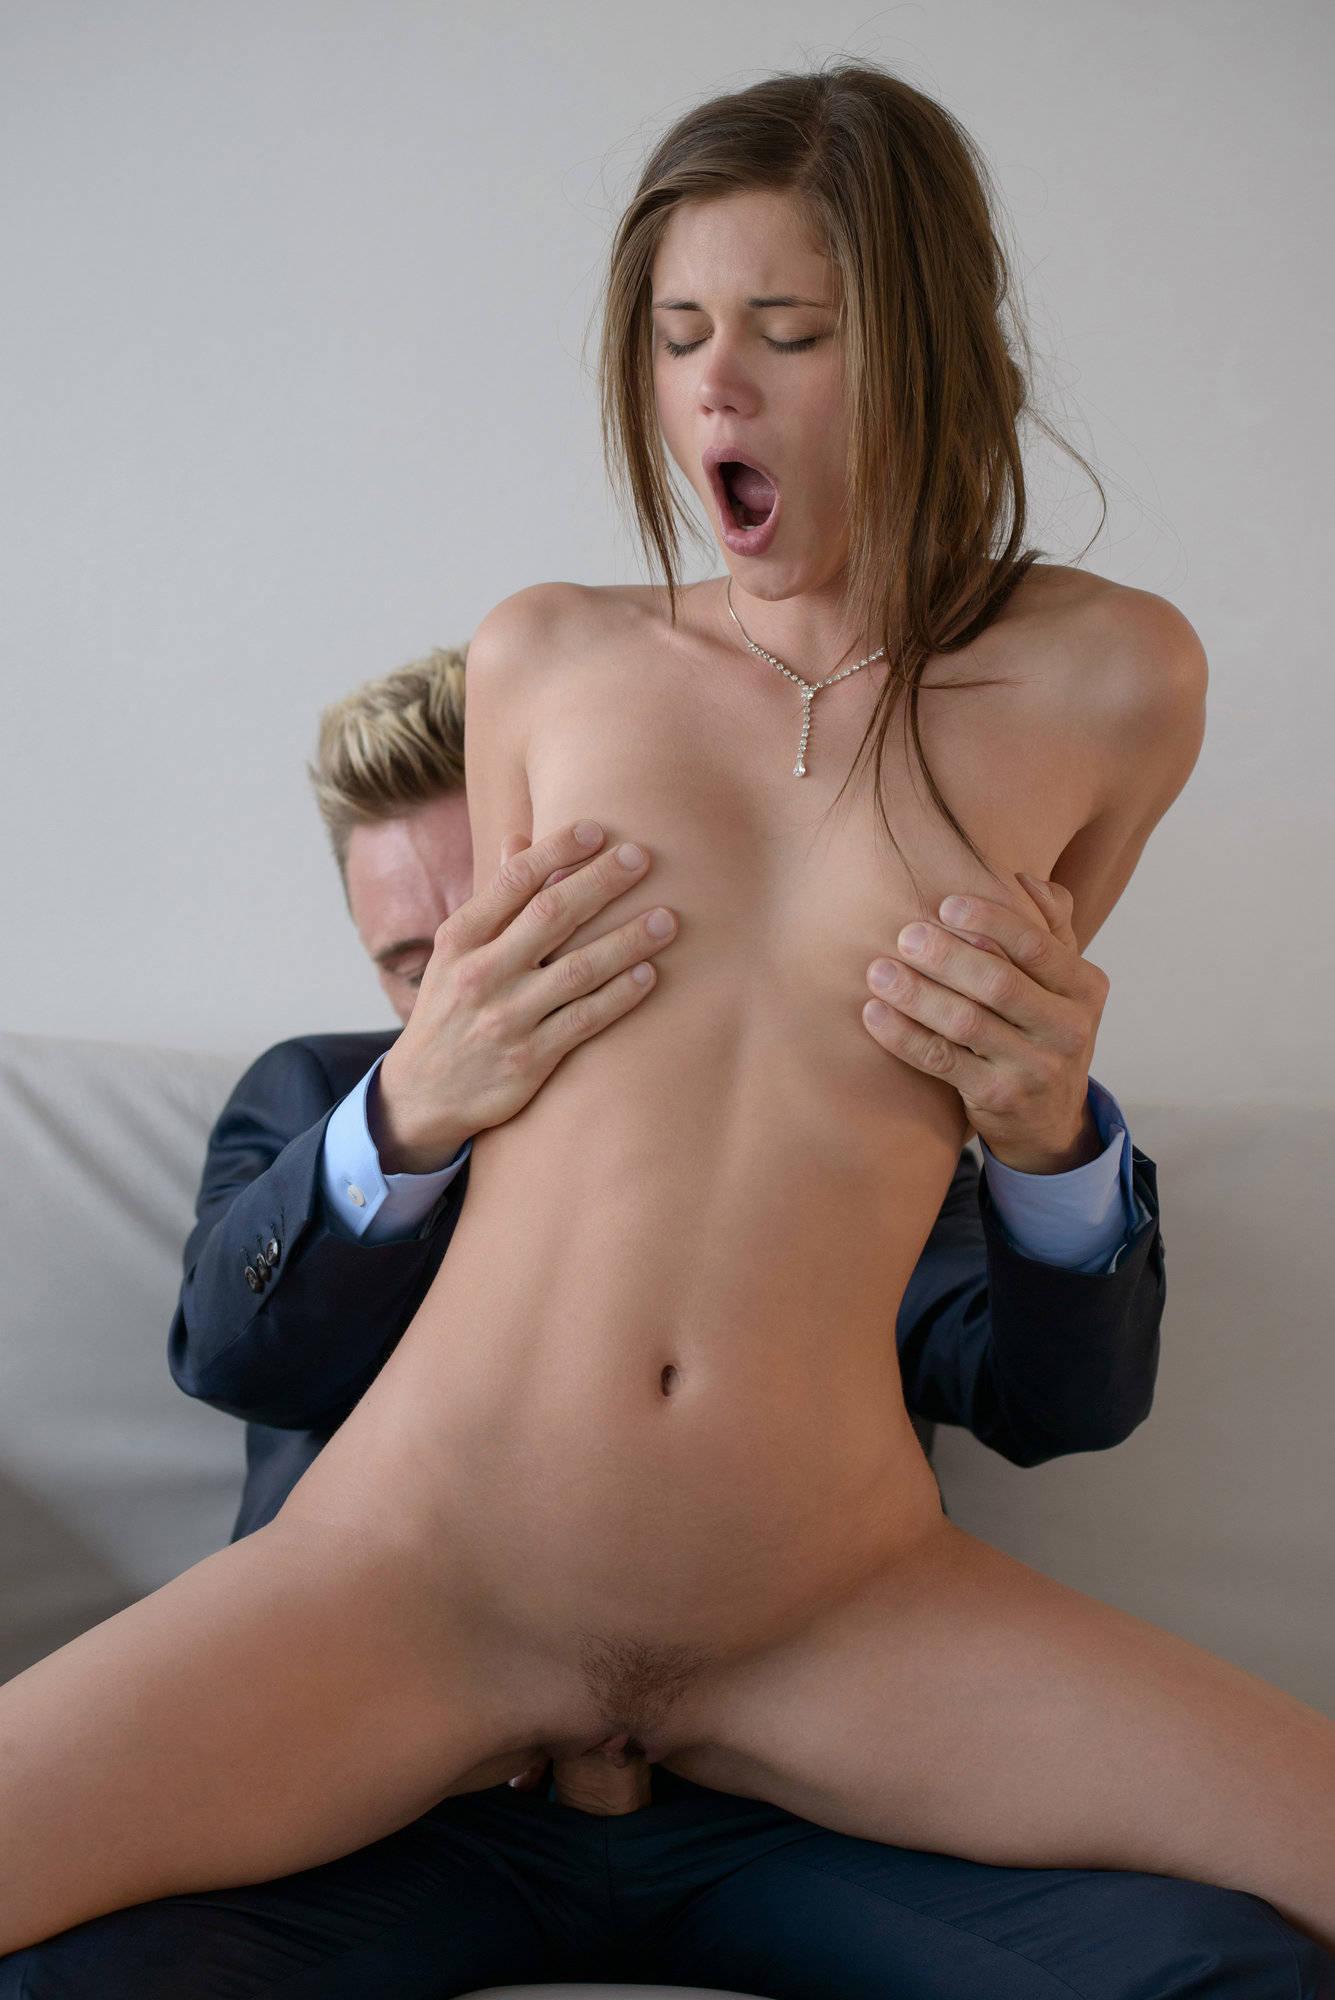 Tania blonde russian milf has missionary sex